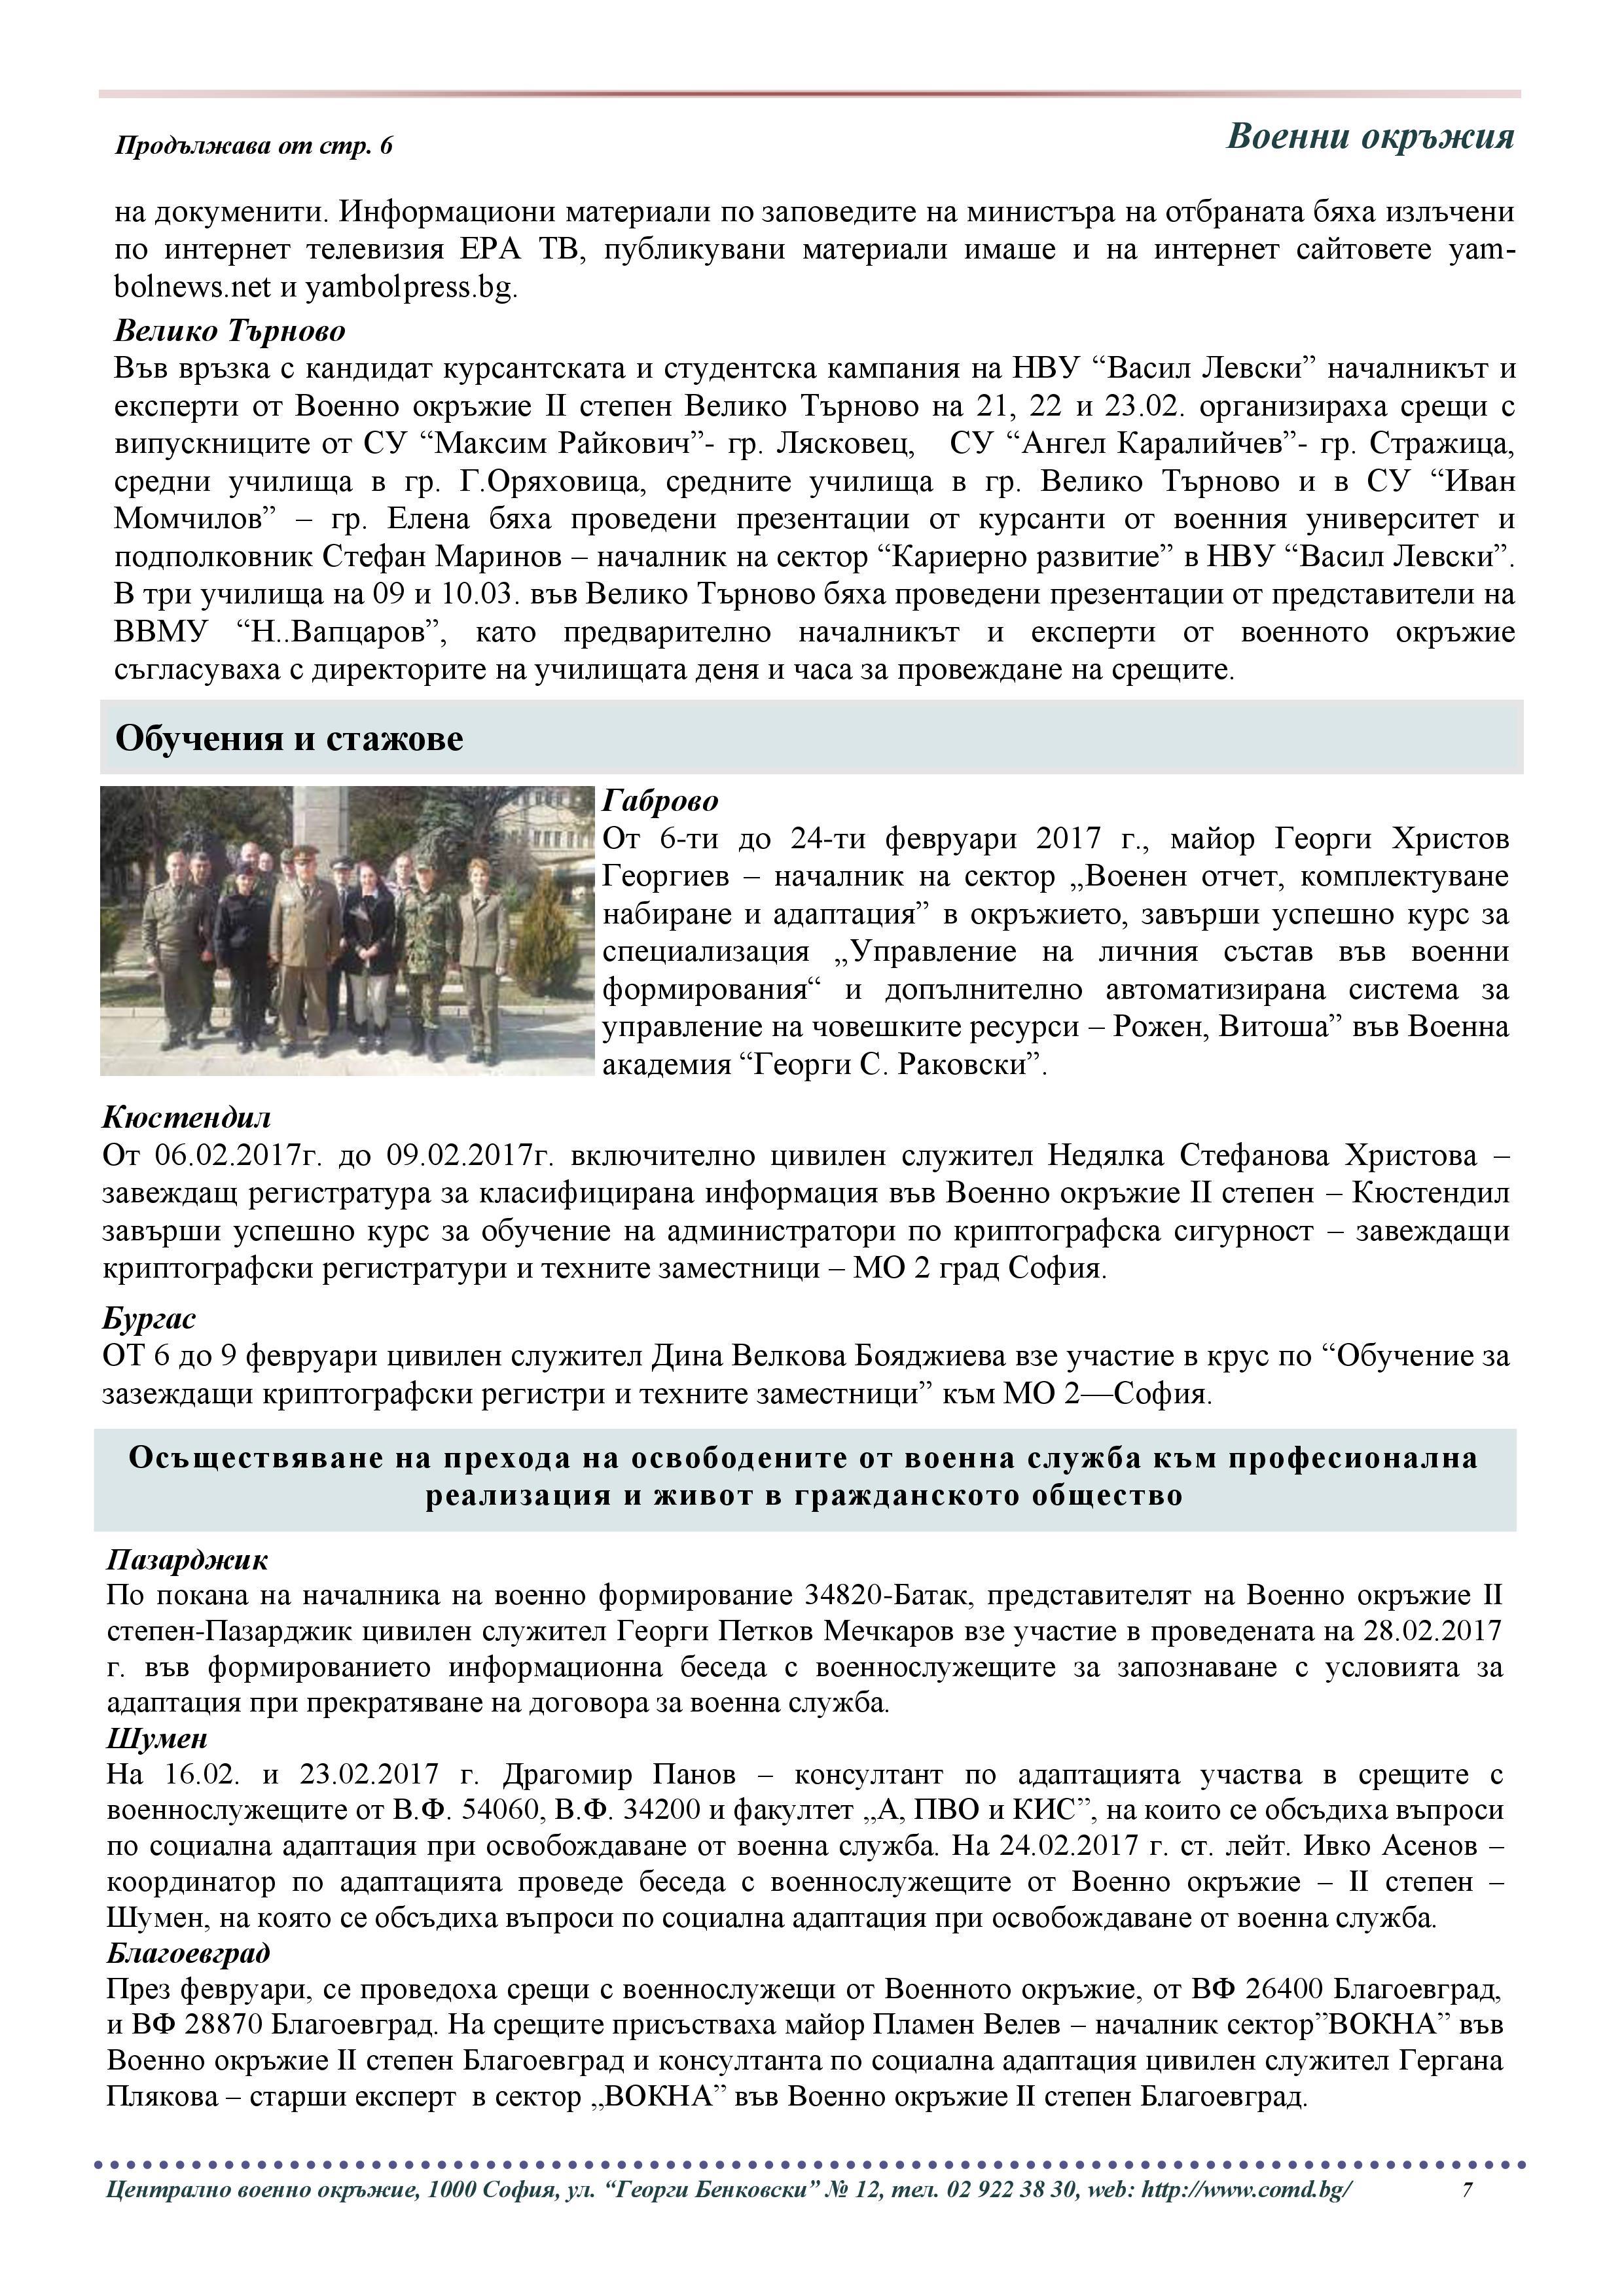 http://armymedia.bg/wp-content/uploads/2015/06/IB_2_2017g.compressed-za-izpra6tane-22.03.2017.page07.jpg